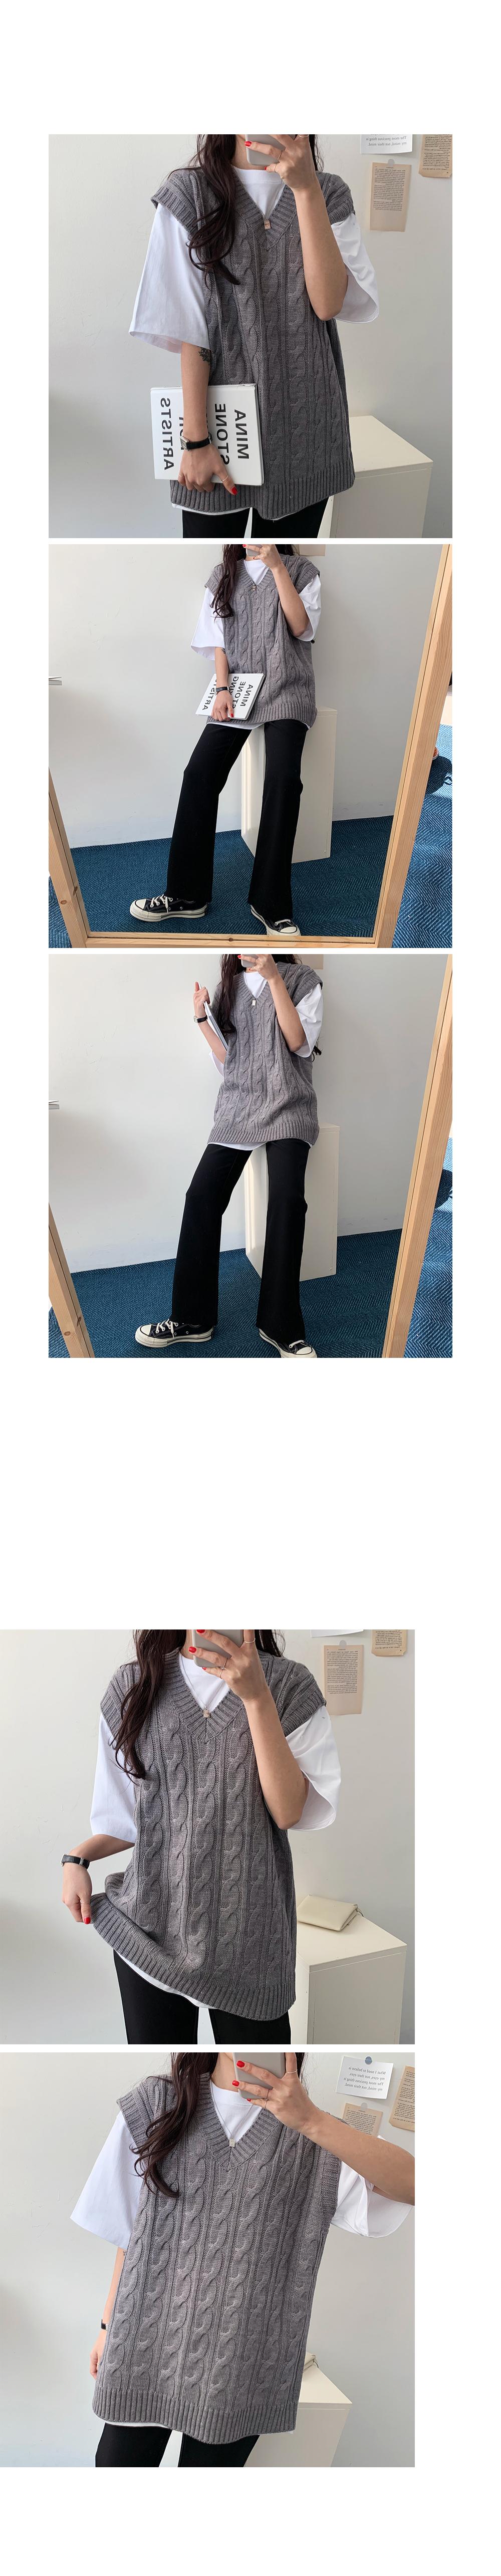 Pastel Twisted V Knitwear Vest